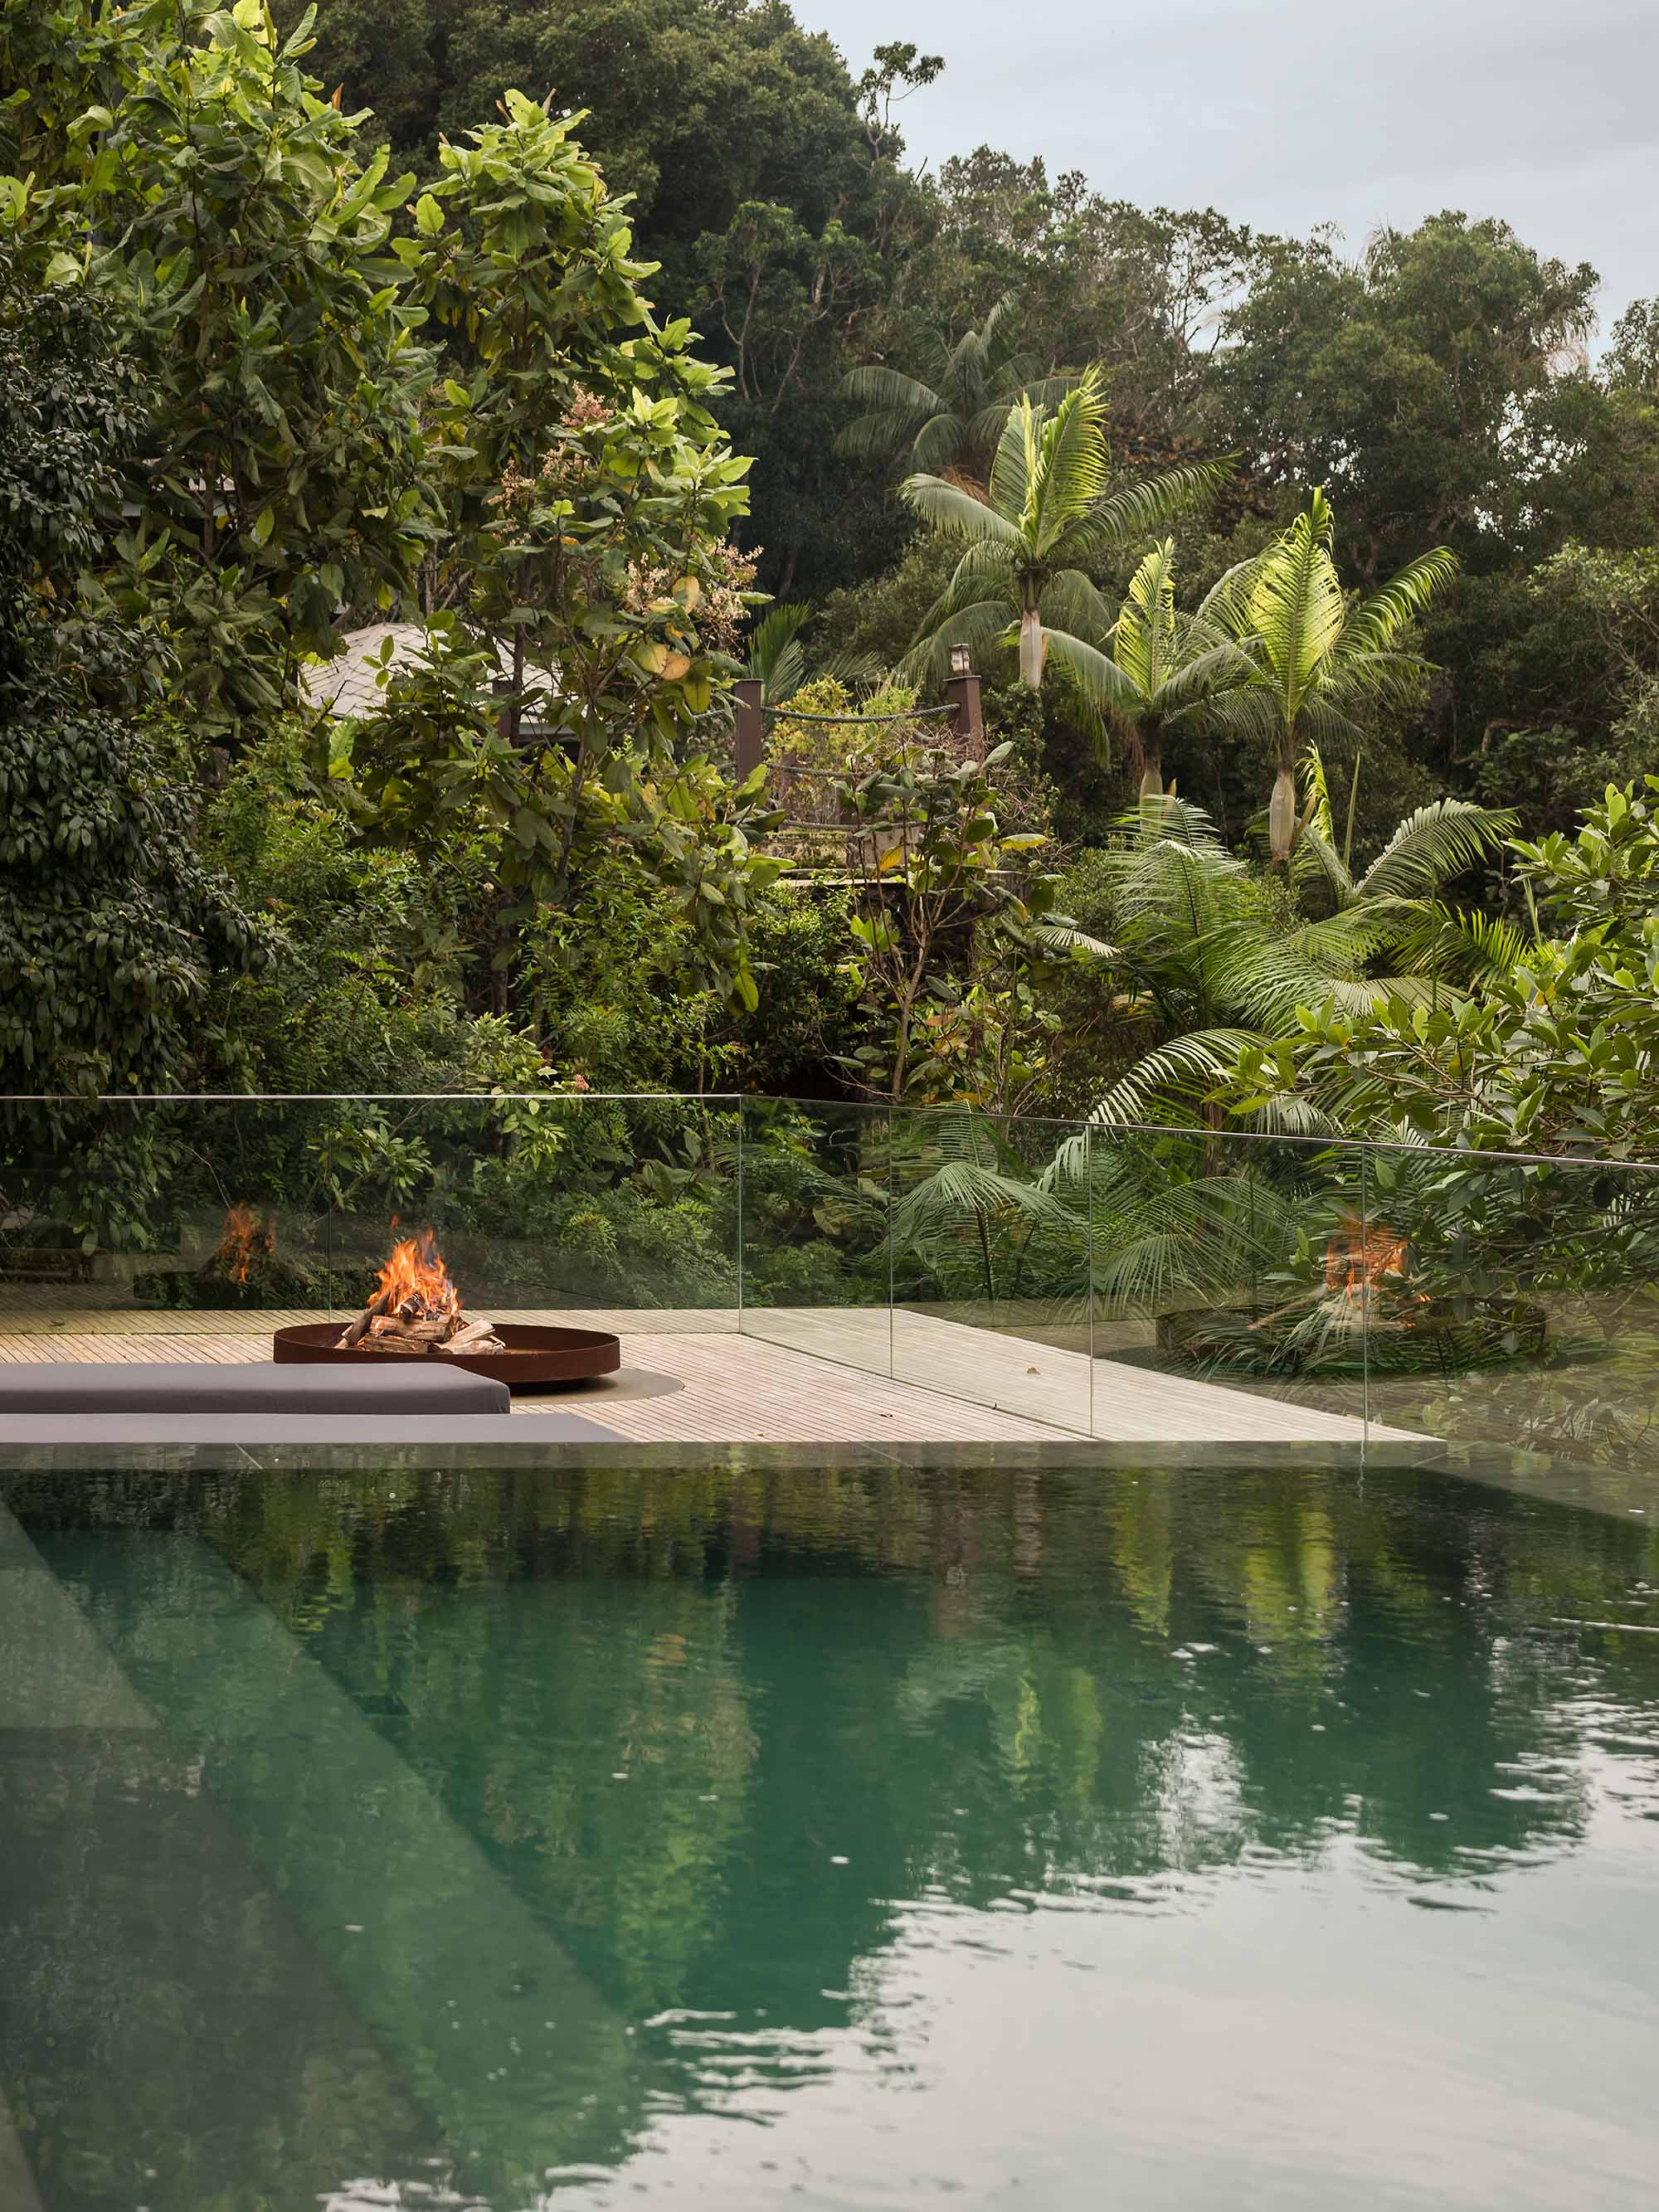 H-House-Life-Jungle-House-Casa-Da-Mata-studio-mk27-mk27_namata_fernandoguerra_medium(34).JPG